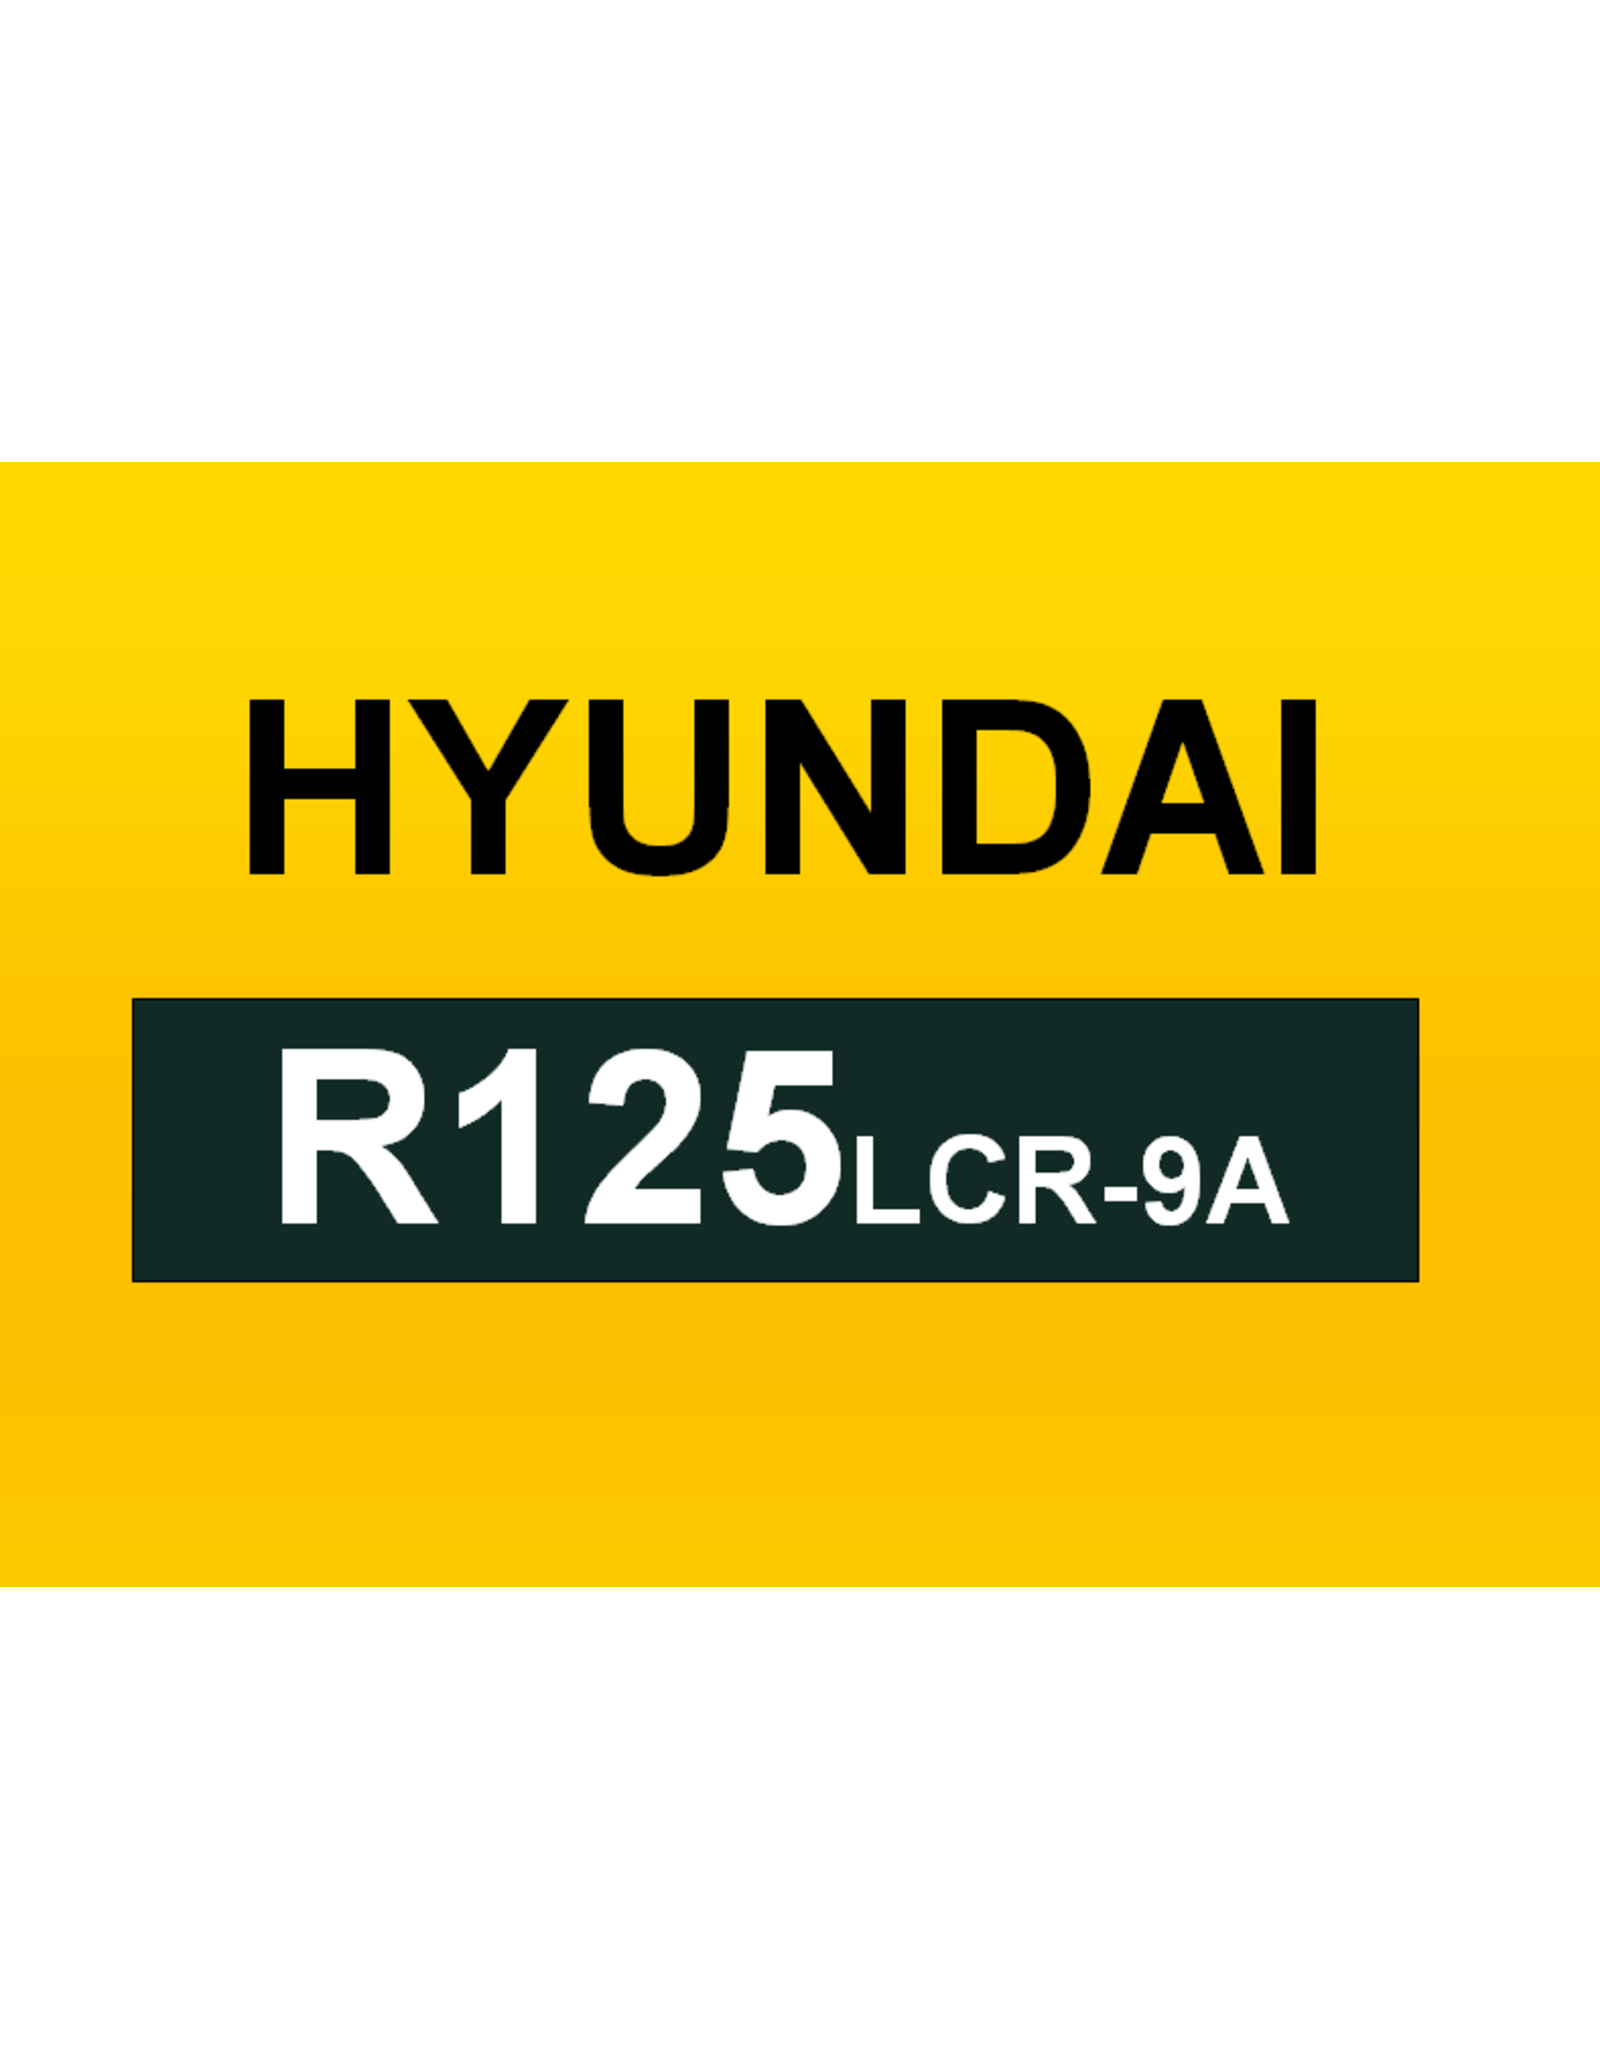 Echle Hartstahl GmbH FOPS pour Hyundai R125LCR-9A